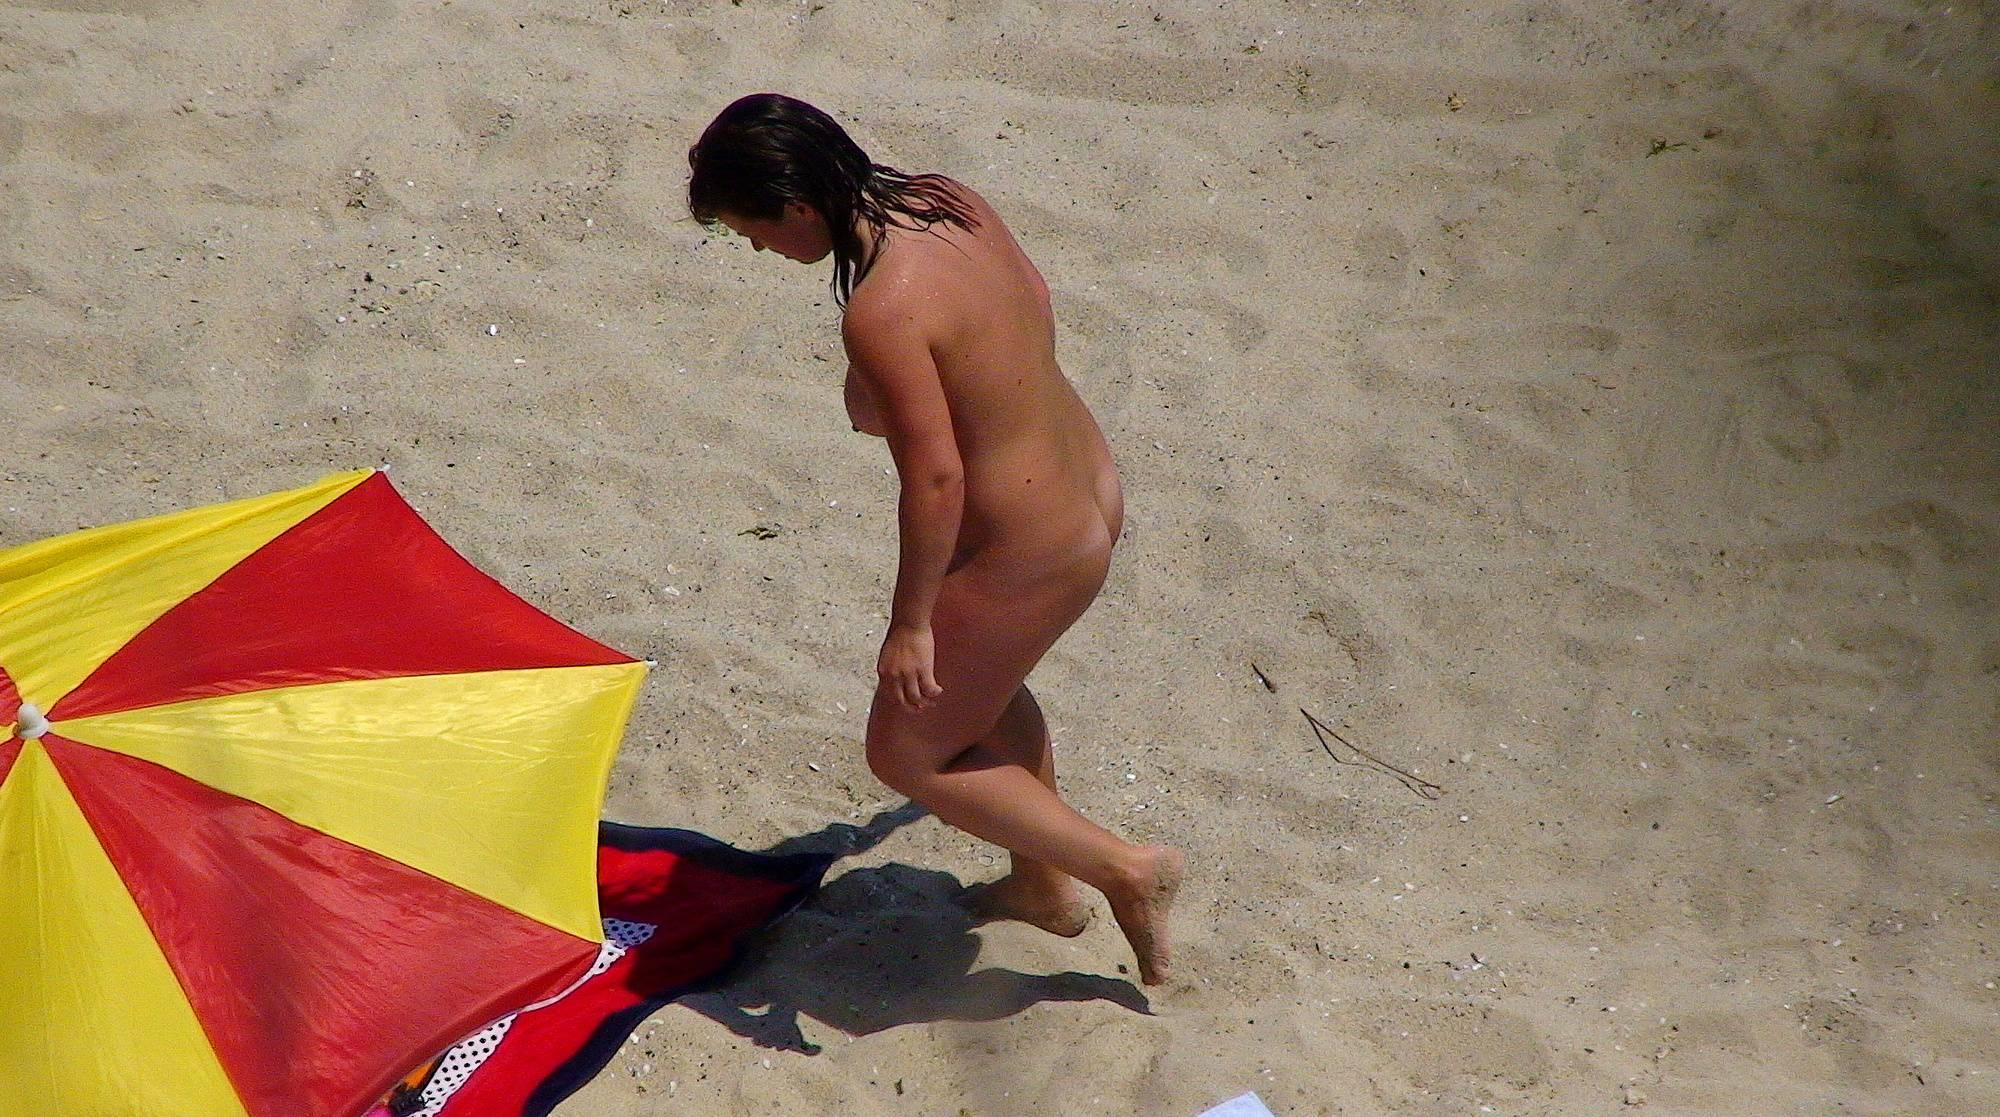 Nude Beach Assortment - 2